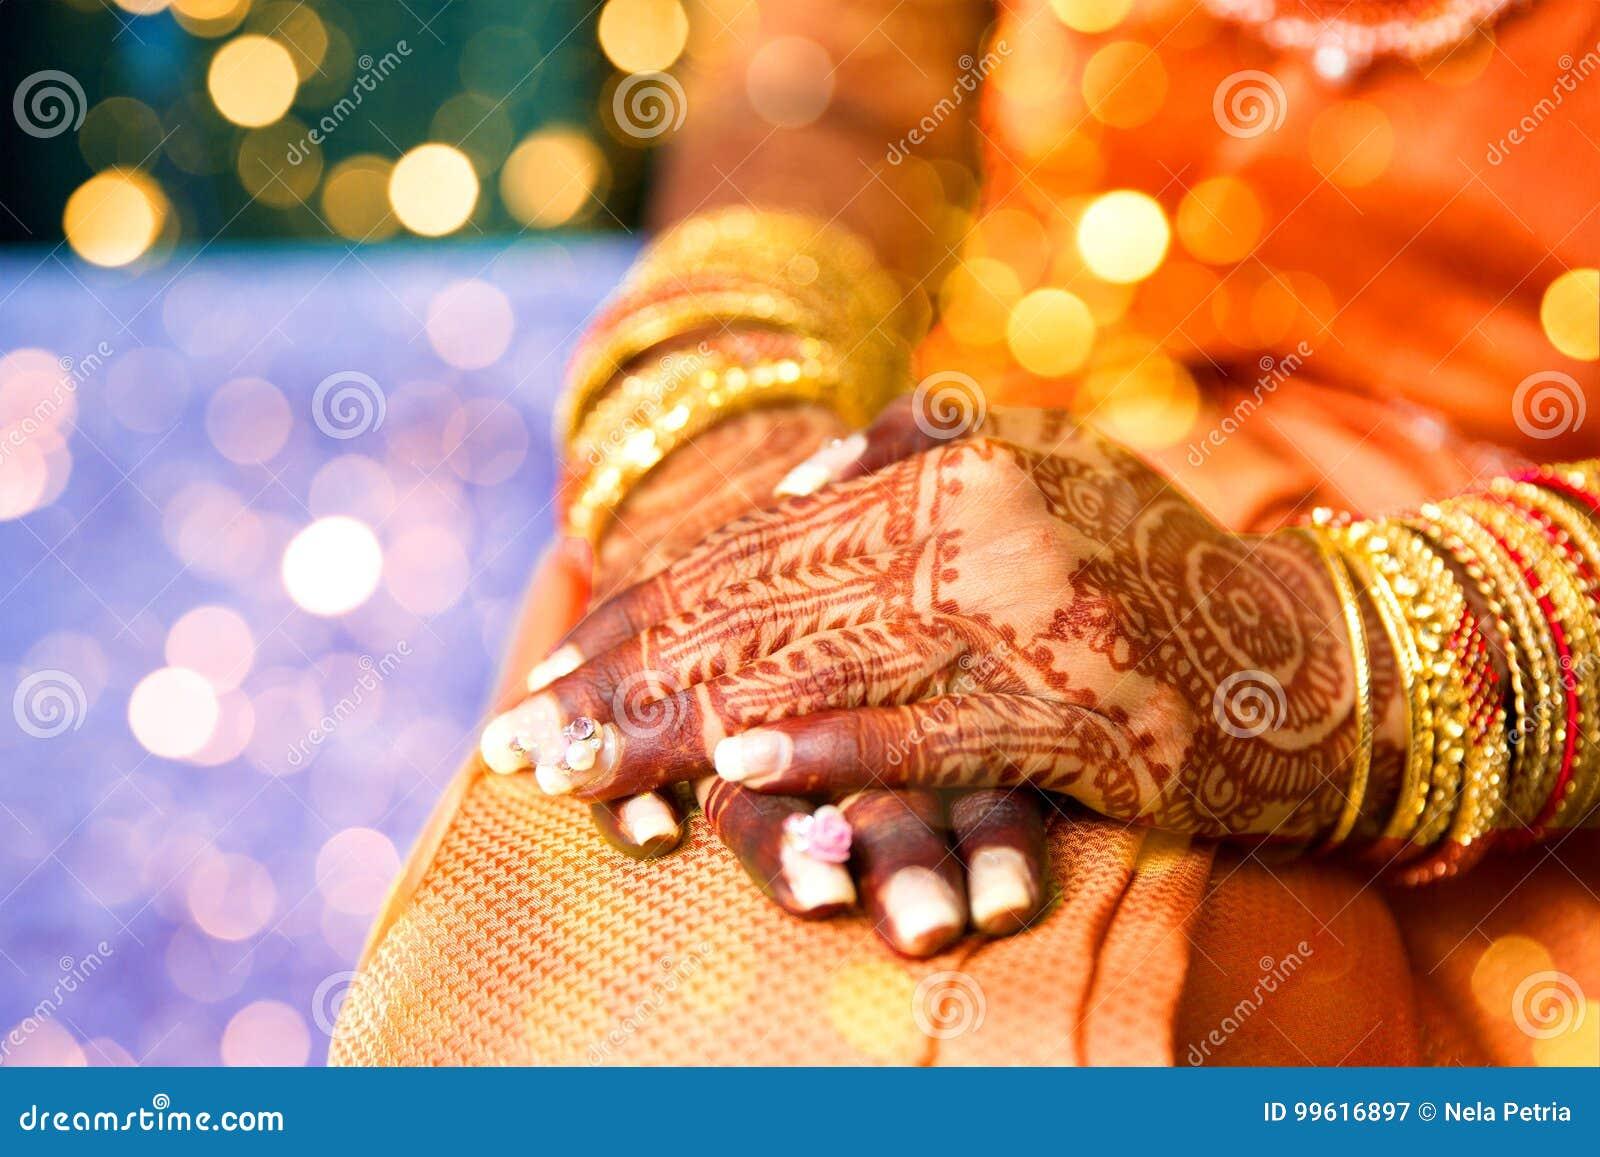 Henna Tattoo Indian Bride Stock Image Image Of Exotic 99616897